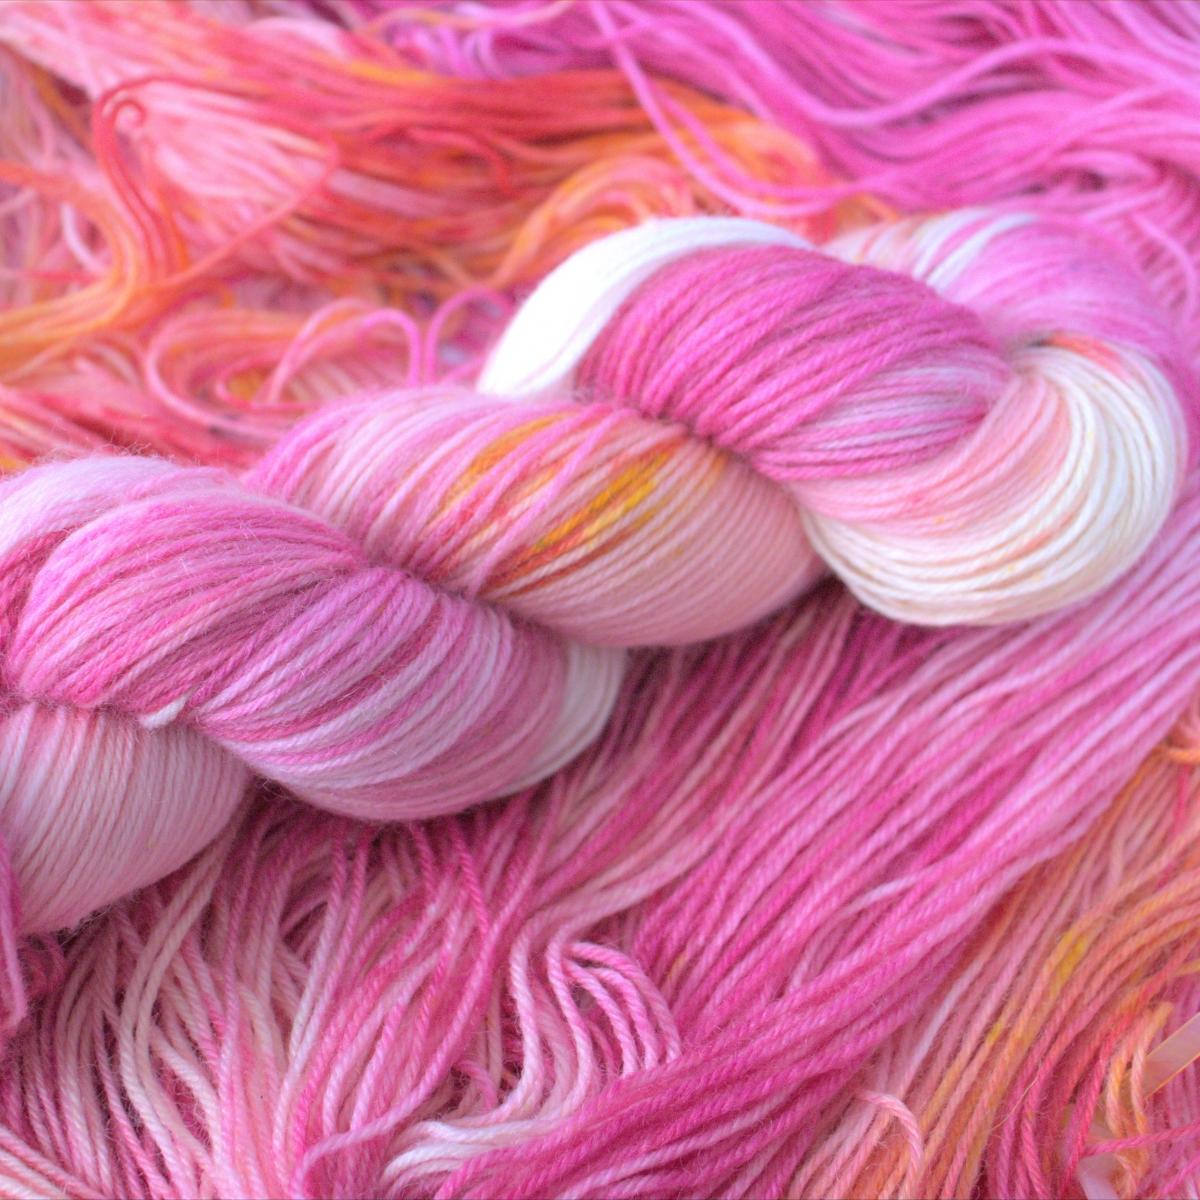 woodico.pro hand dyed yarn 053 1200x1200 - Hand dyed yarn / 053